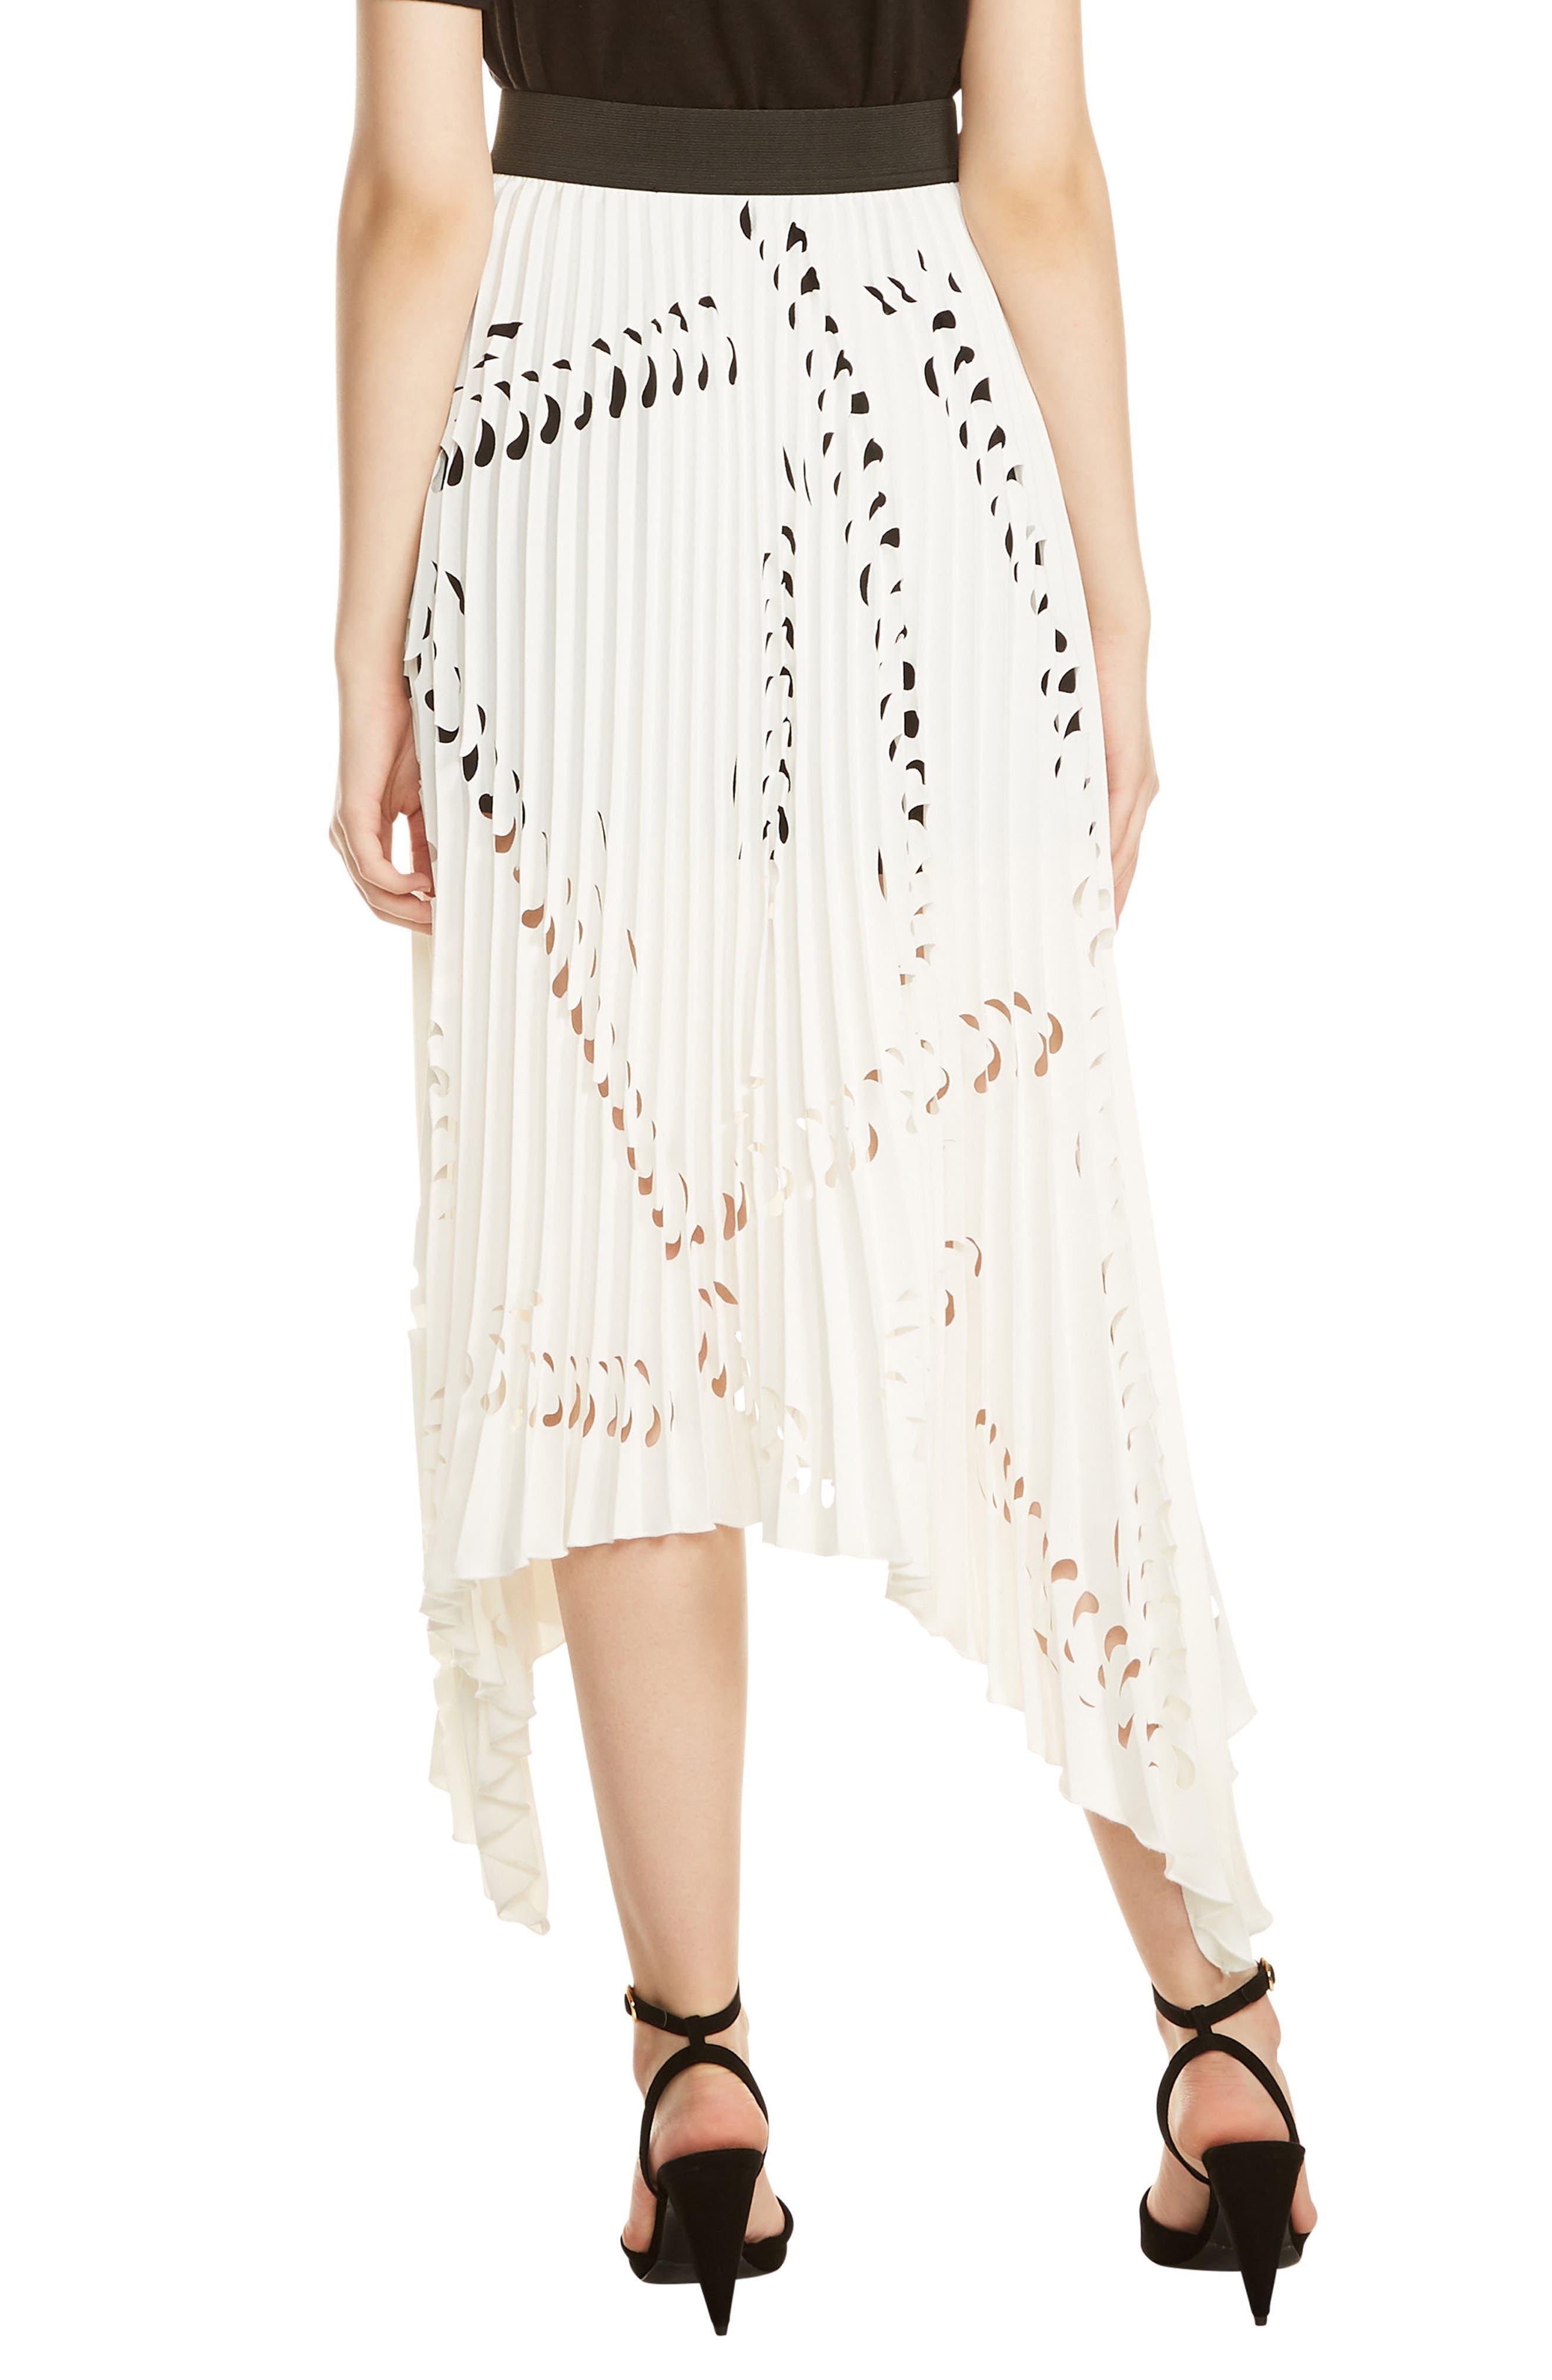 Jeflexe Cutout Pleat Midi Skirt,                             Alternate thumbnail 2, color,                             100